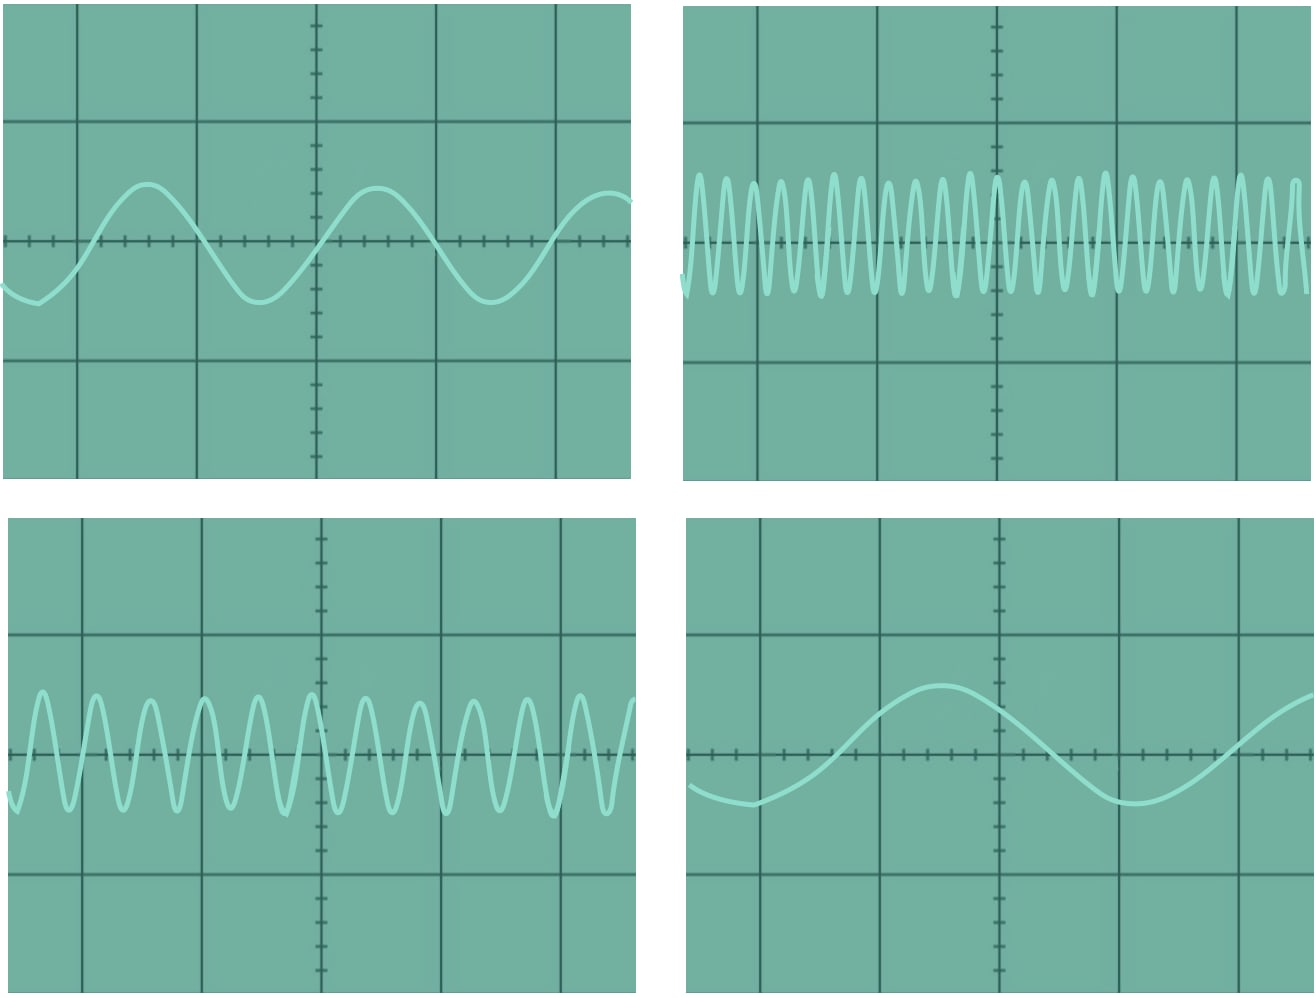 Oscilloscope images